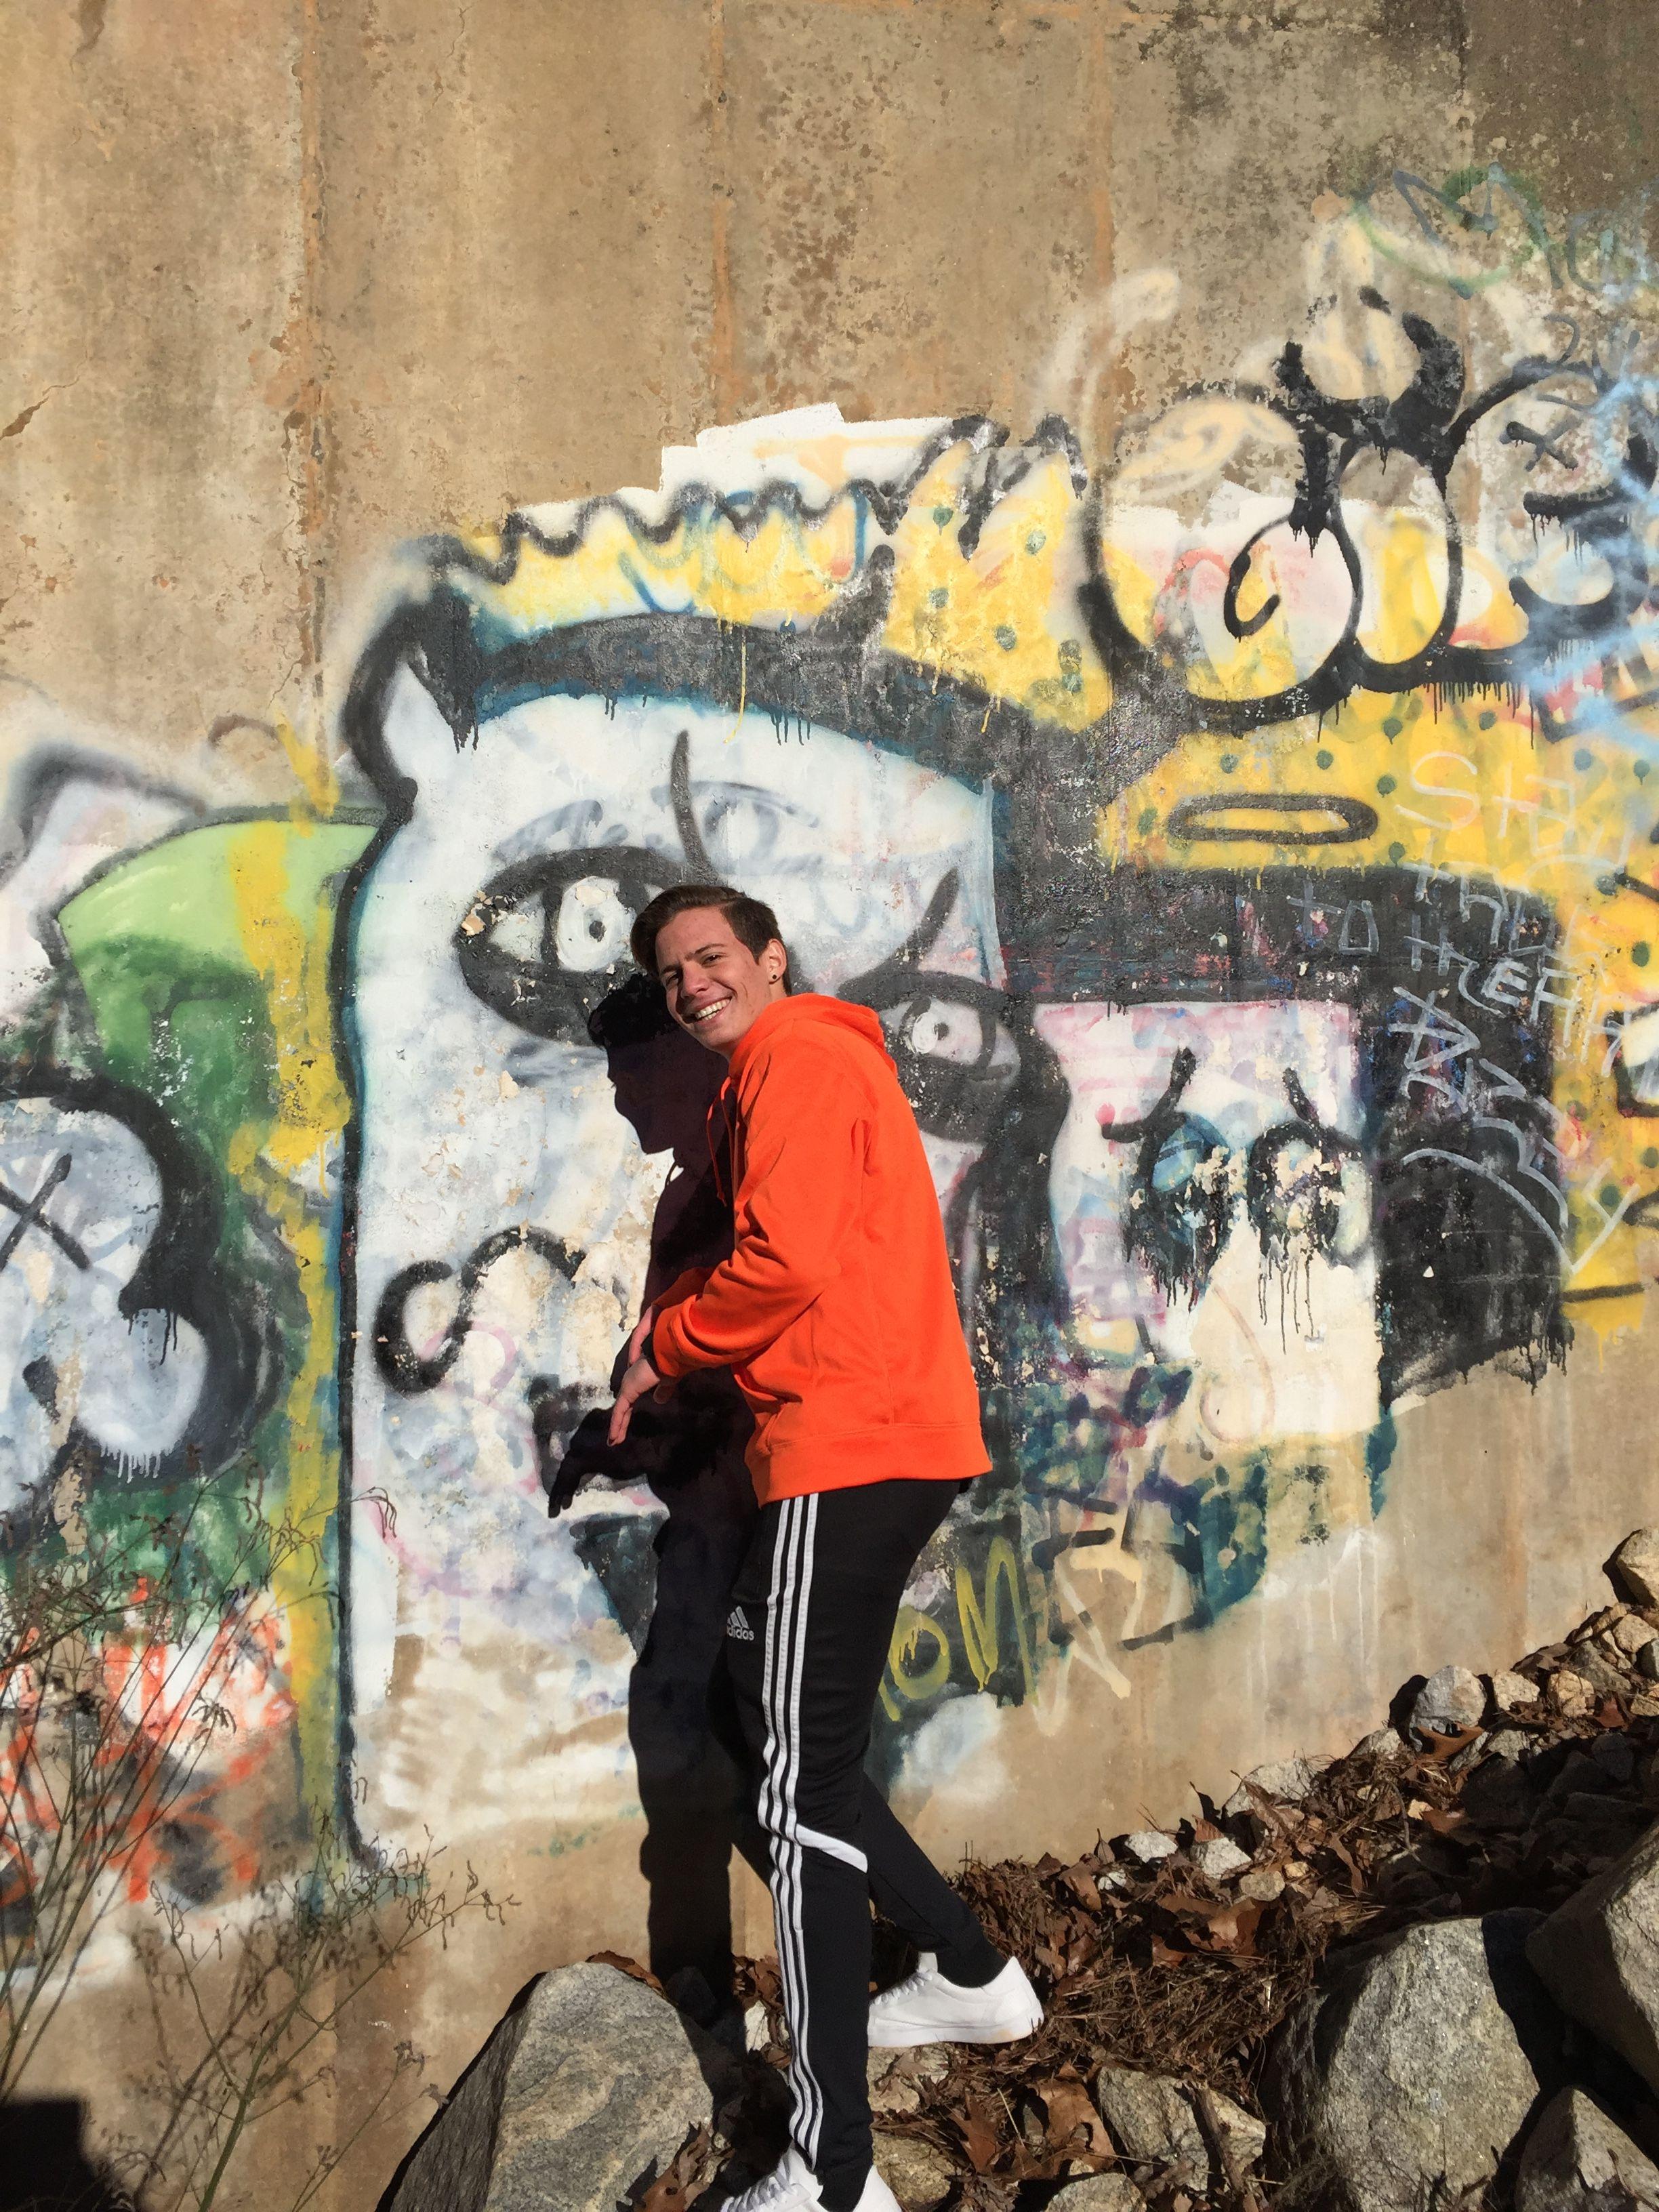 Graffiti wall chelmsford - Nike Orange Sweatshirt Adidas Pants Graffiti Wall